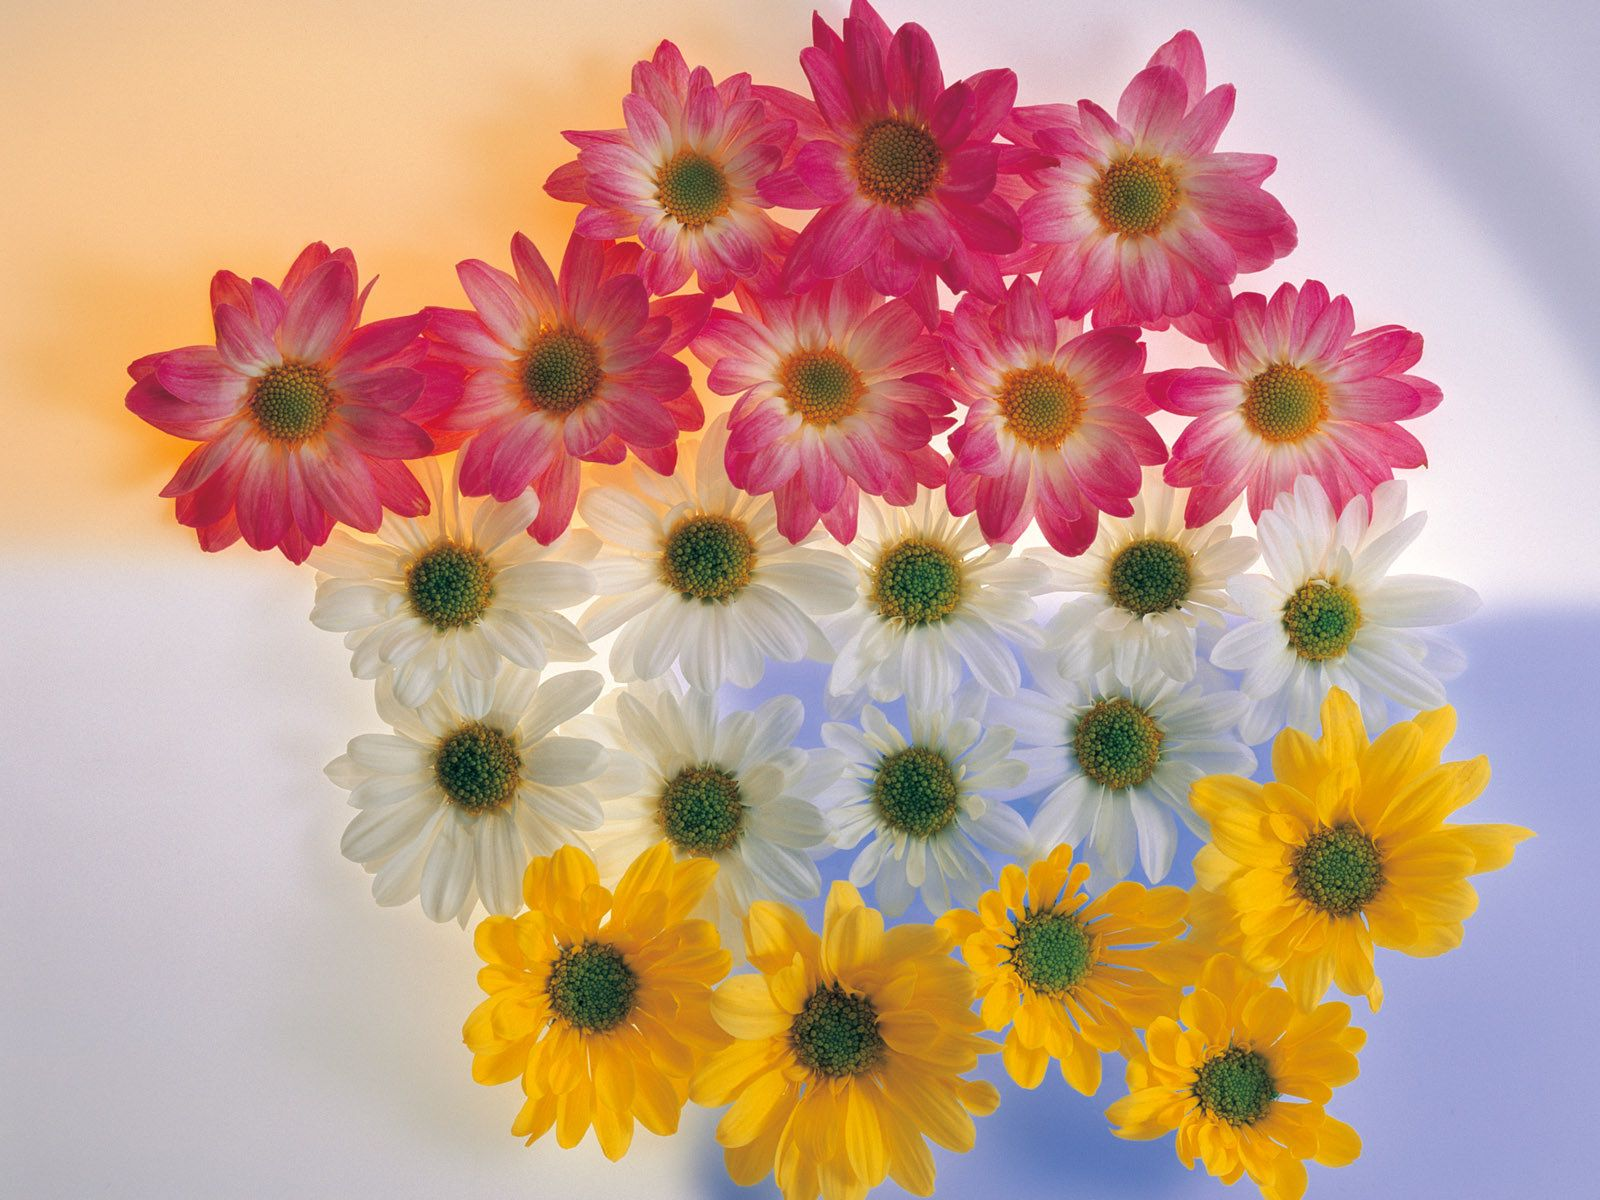 Beautiful Flowers Hd Wallpapers Beautiful Flowers Colors Wallpaper